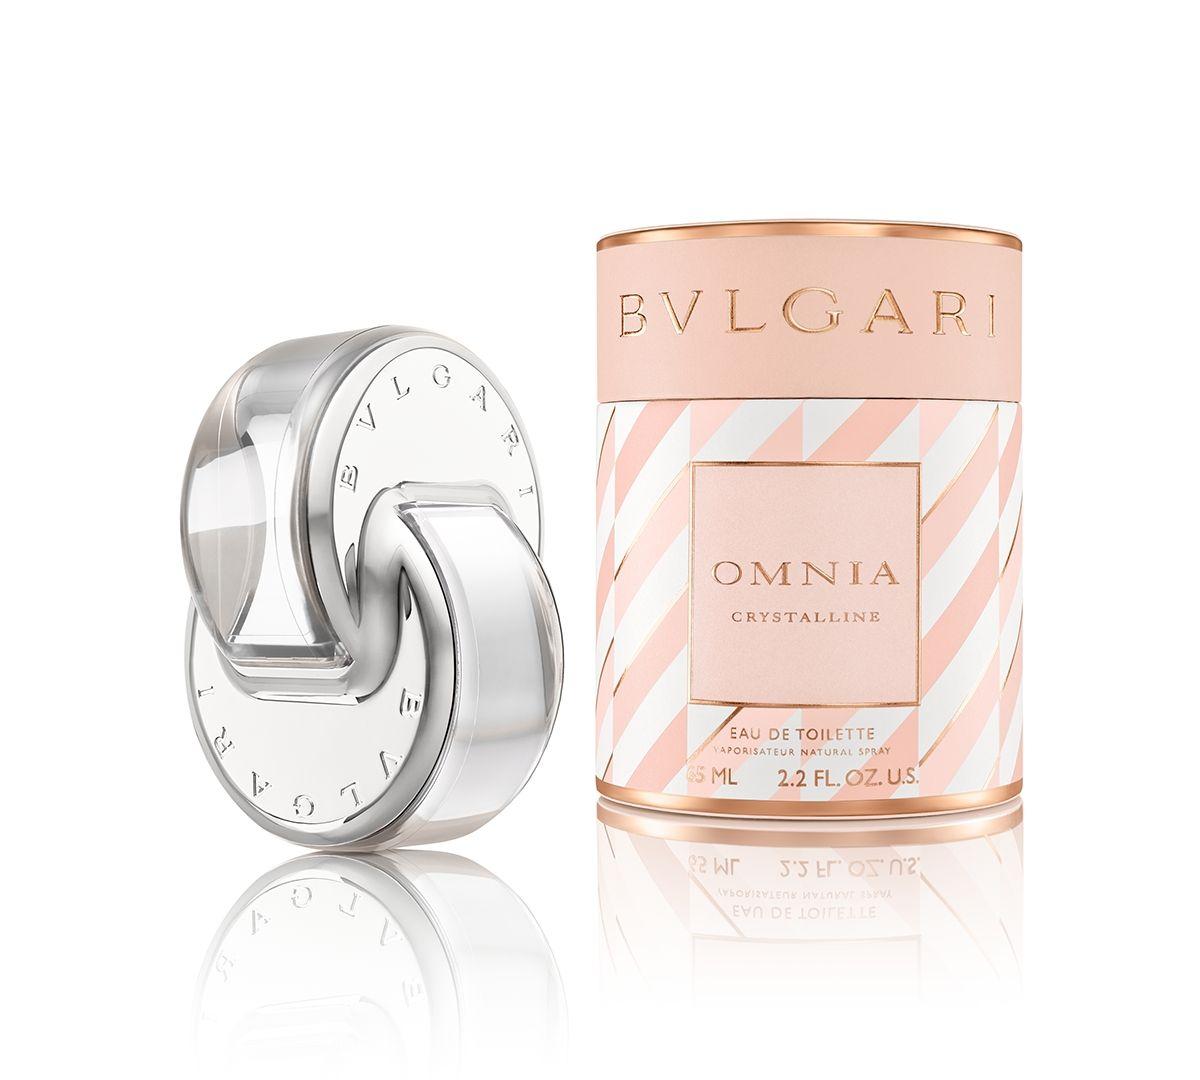 Bvlgari Omnia Crystalline Candy Shop Edition Eau De Toilette 2 2 Oz Bvlgari Omnia Crystalline Omnia Crystalline Eau De Toilette